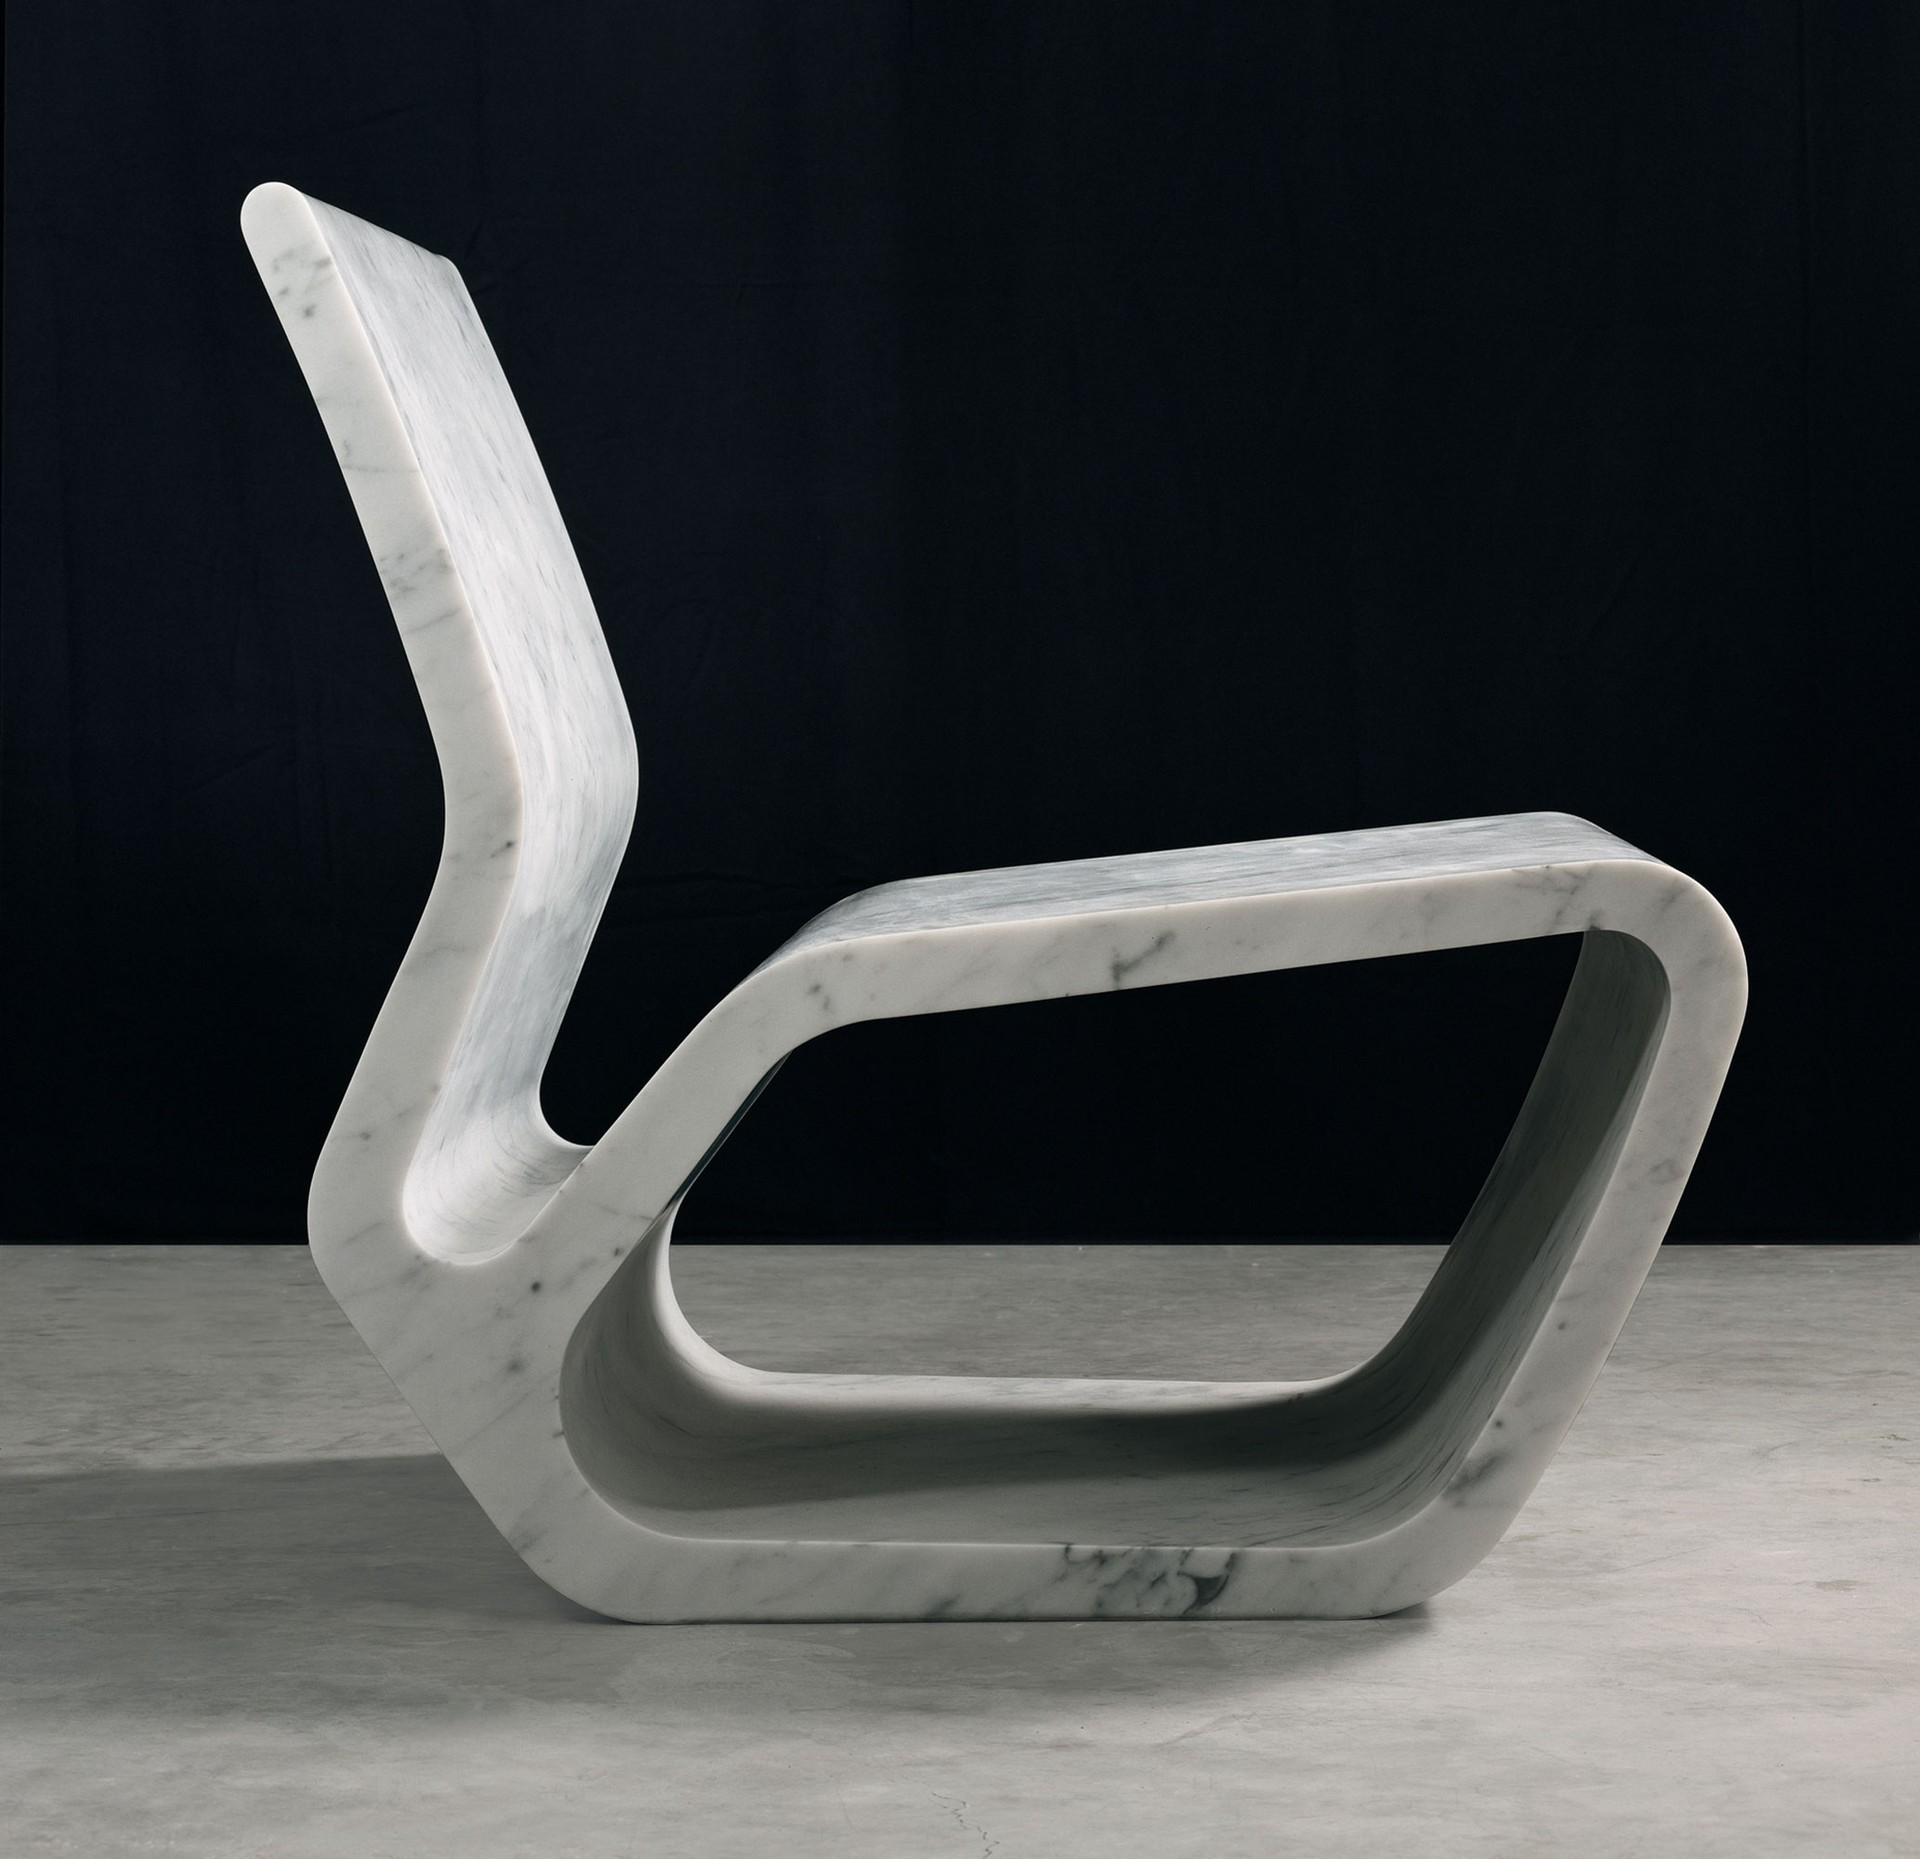 New Chair Designs